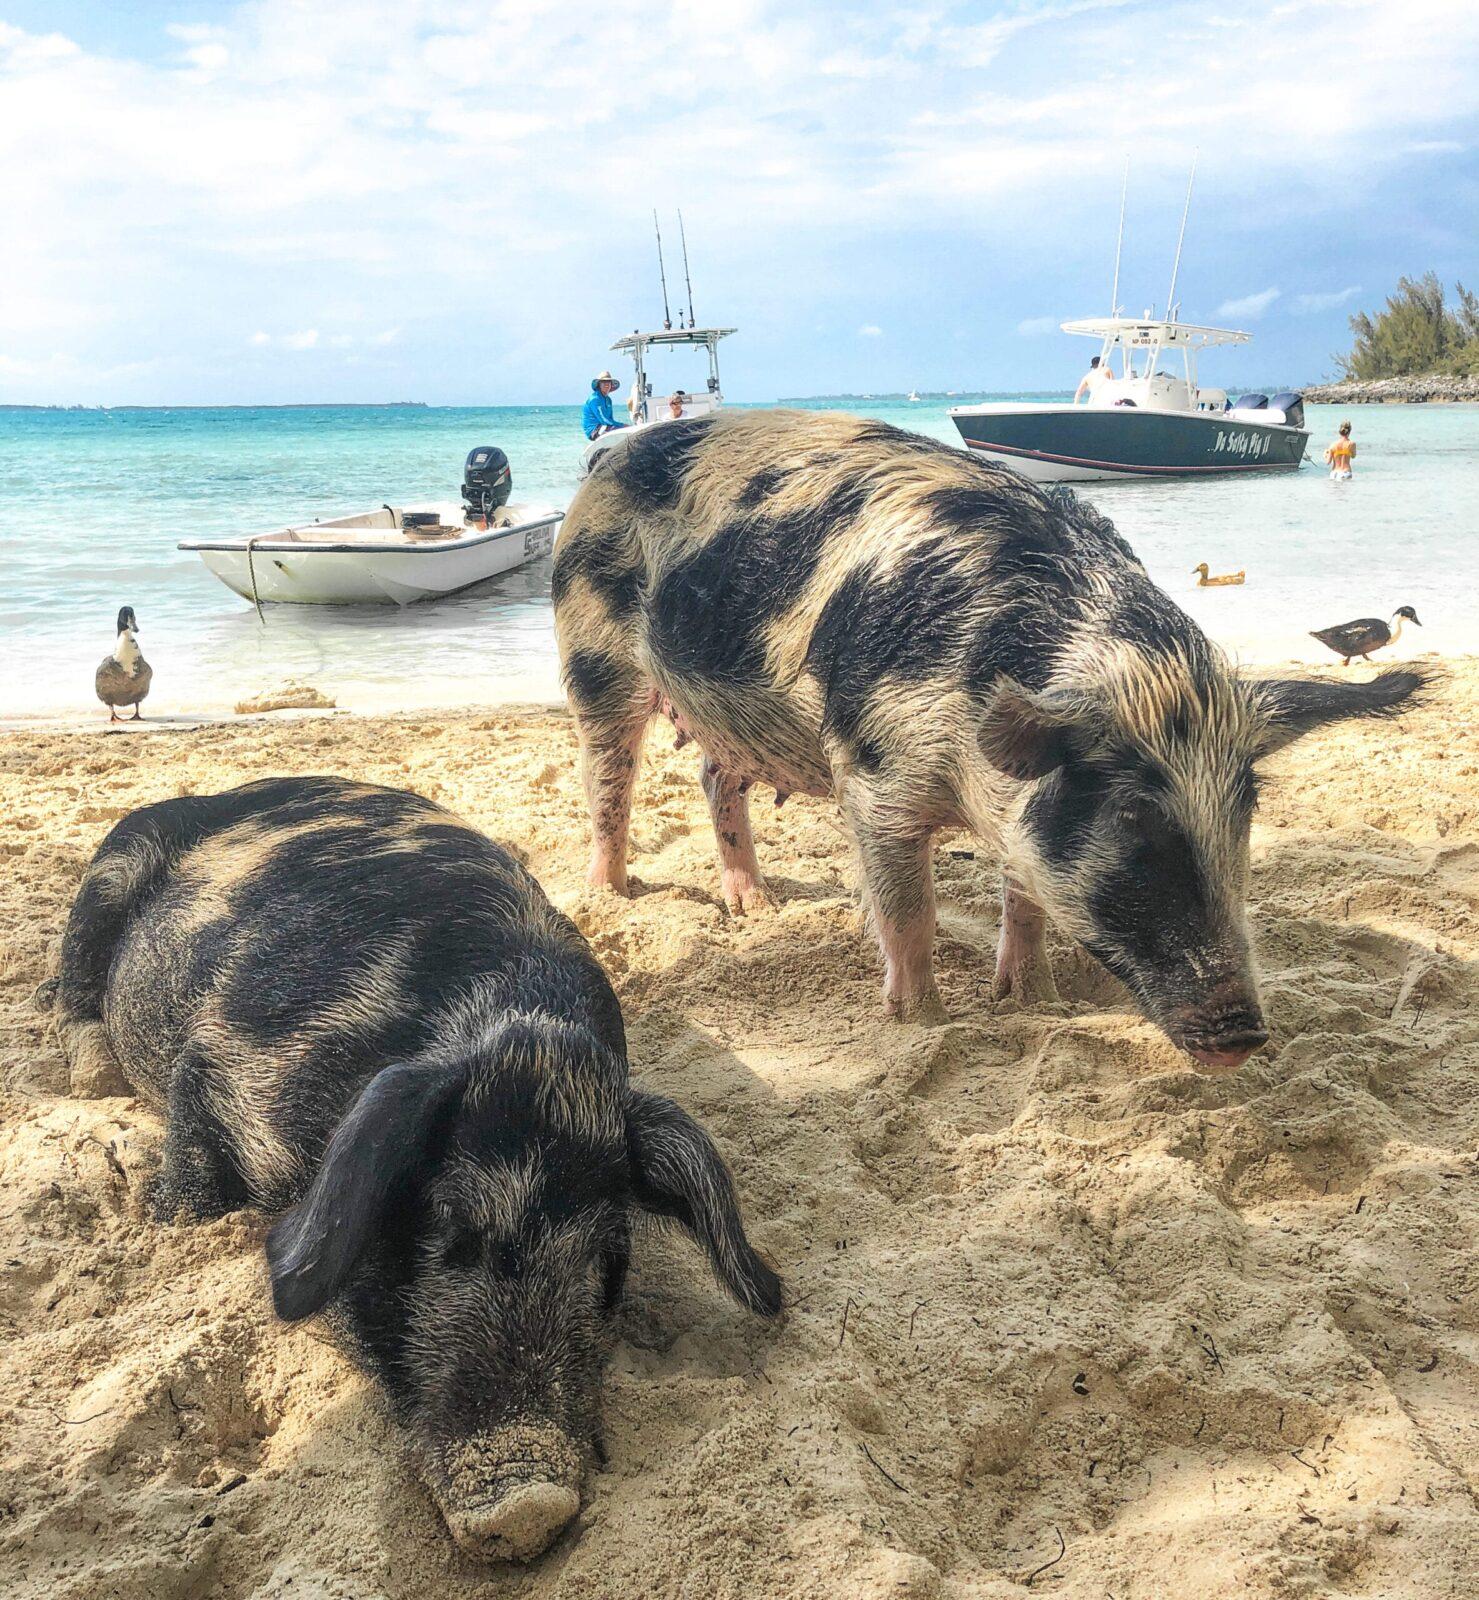 pig editedddd 1